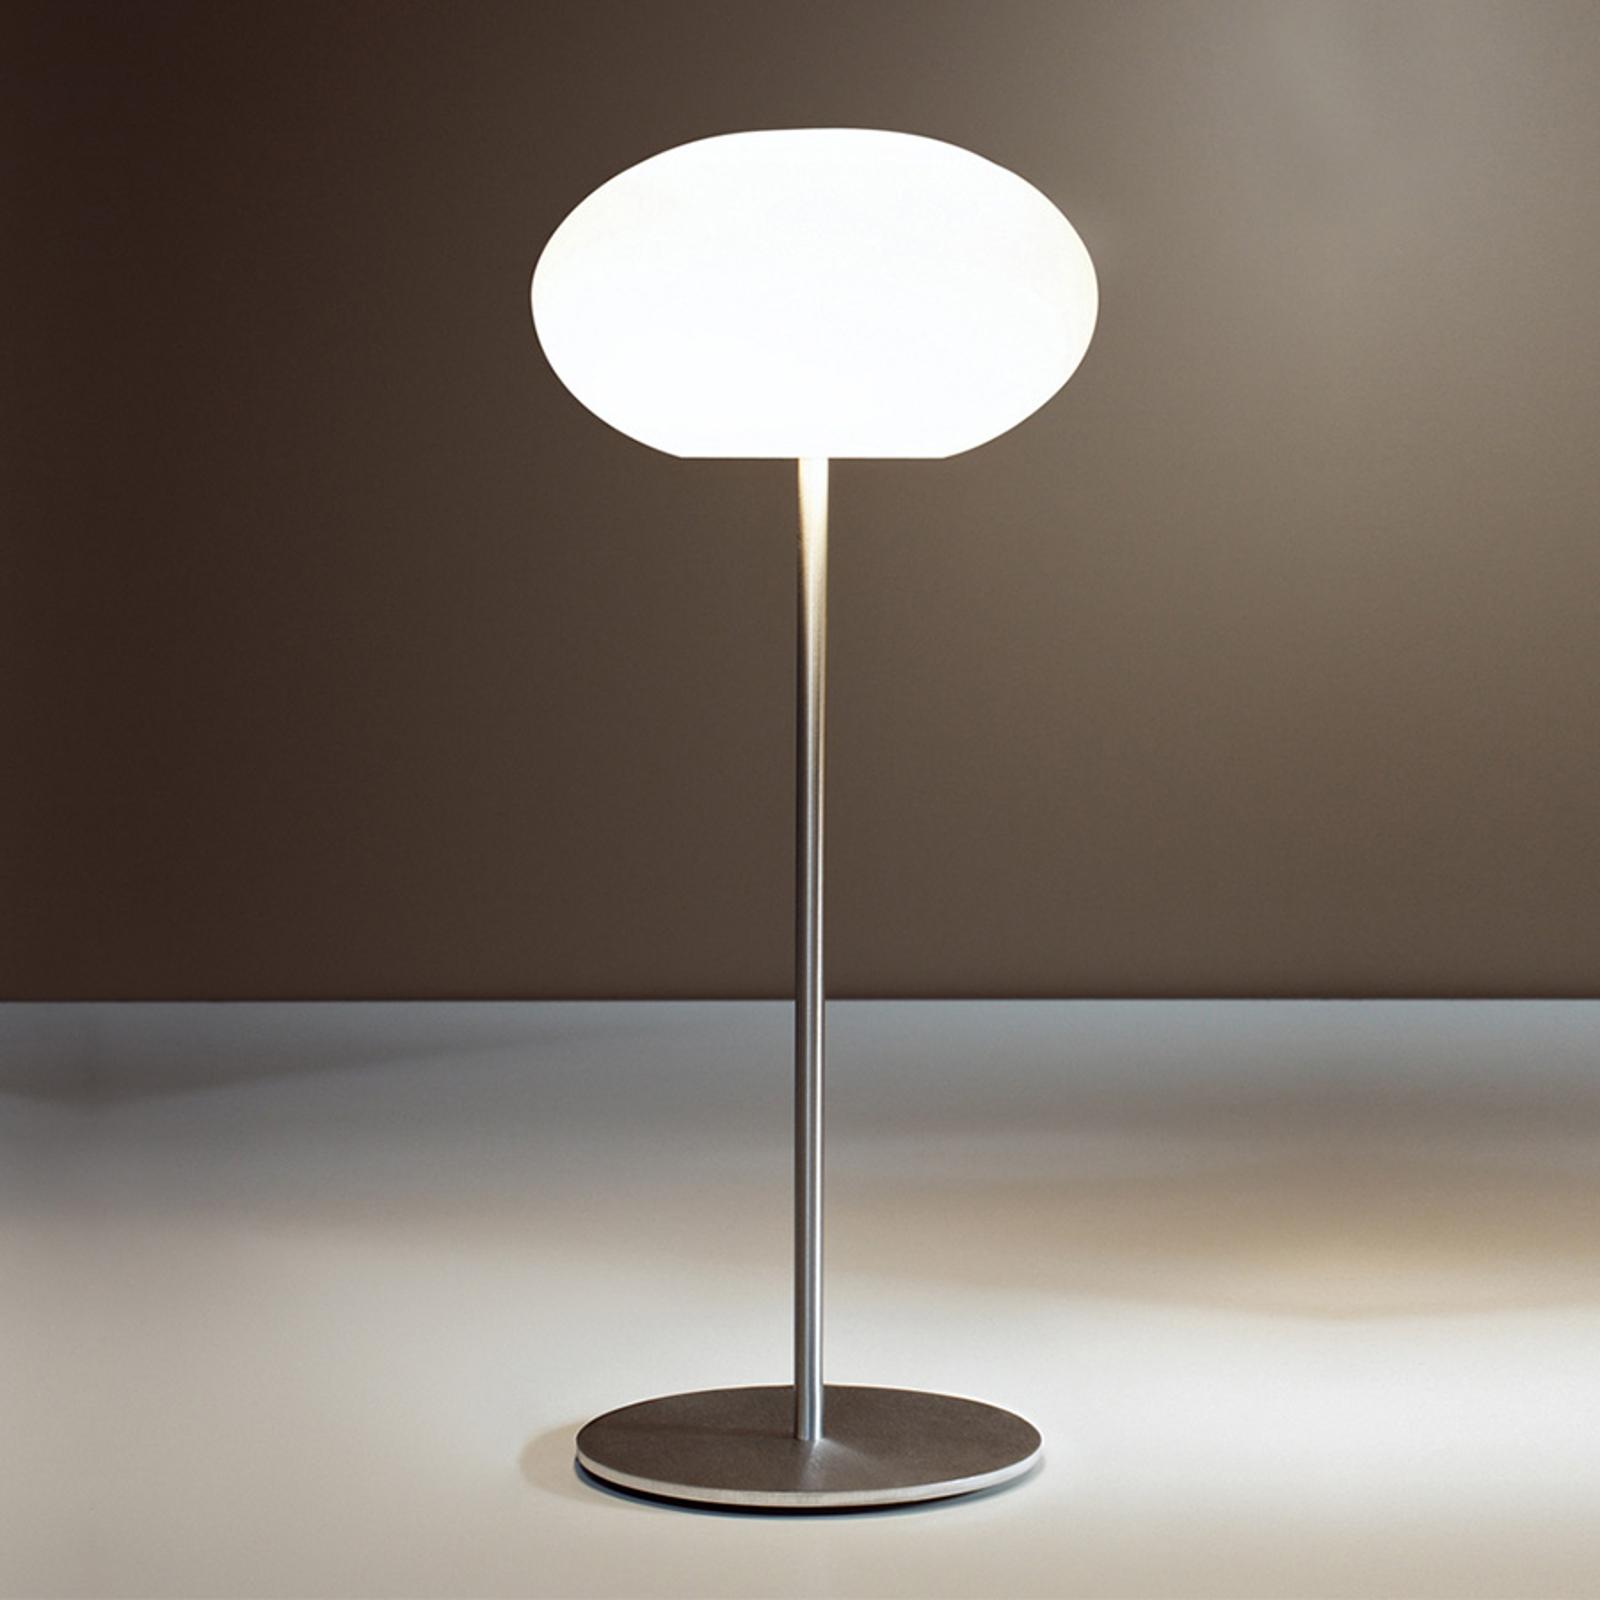 Casablanca Aih pöytälamppu, Ø 19 cm kiiltävä